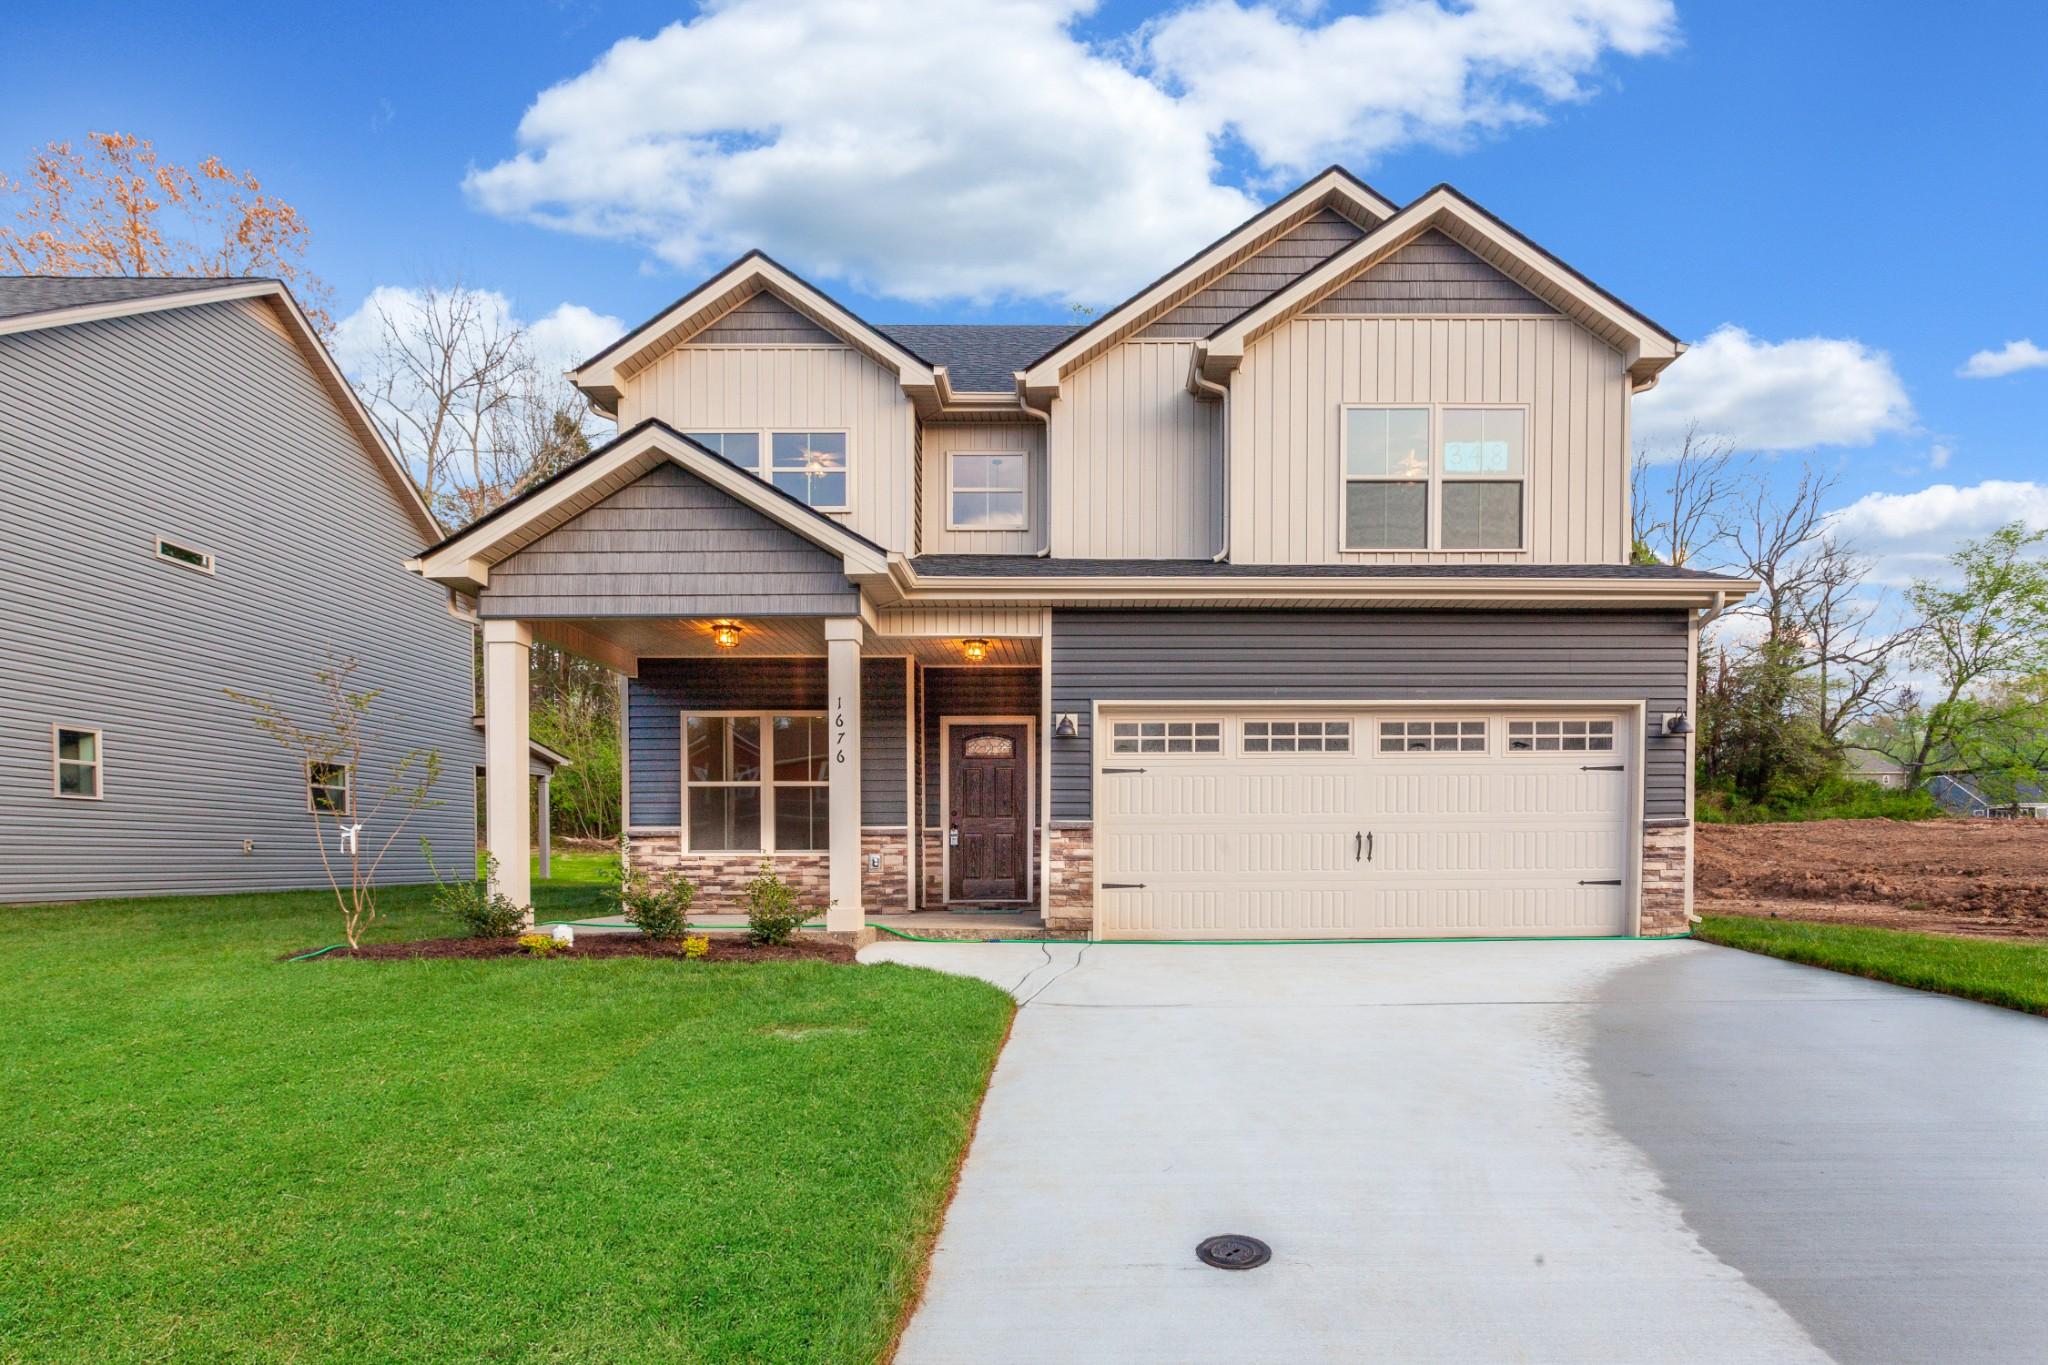 1676 Rains Rd, Clarksville, TN 37042 - Clarksville, TN real estate listing